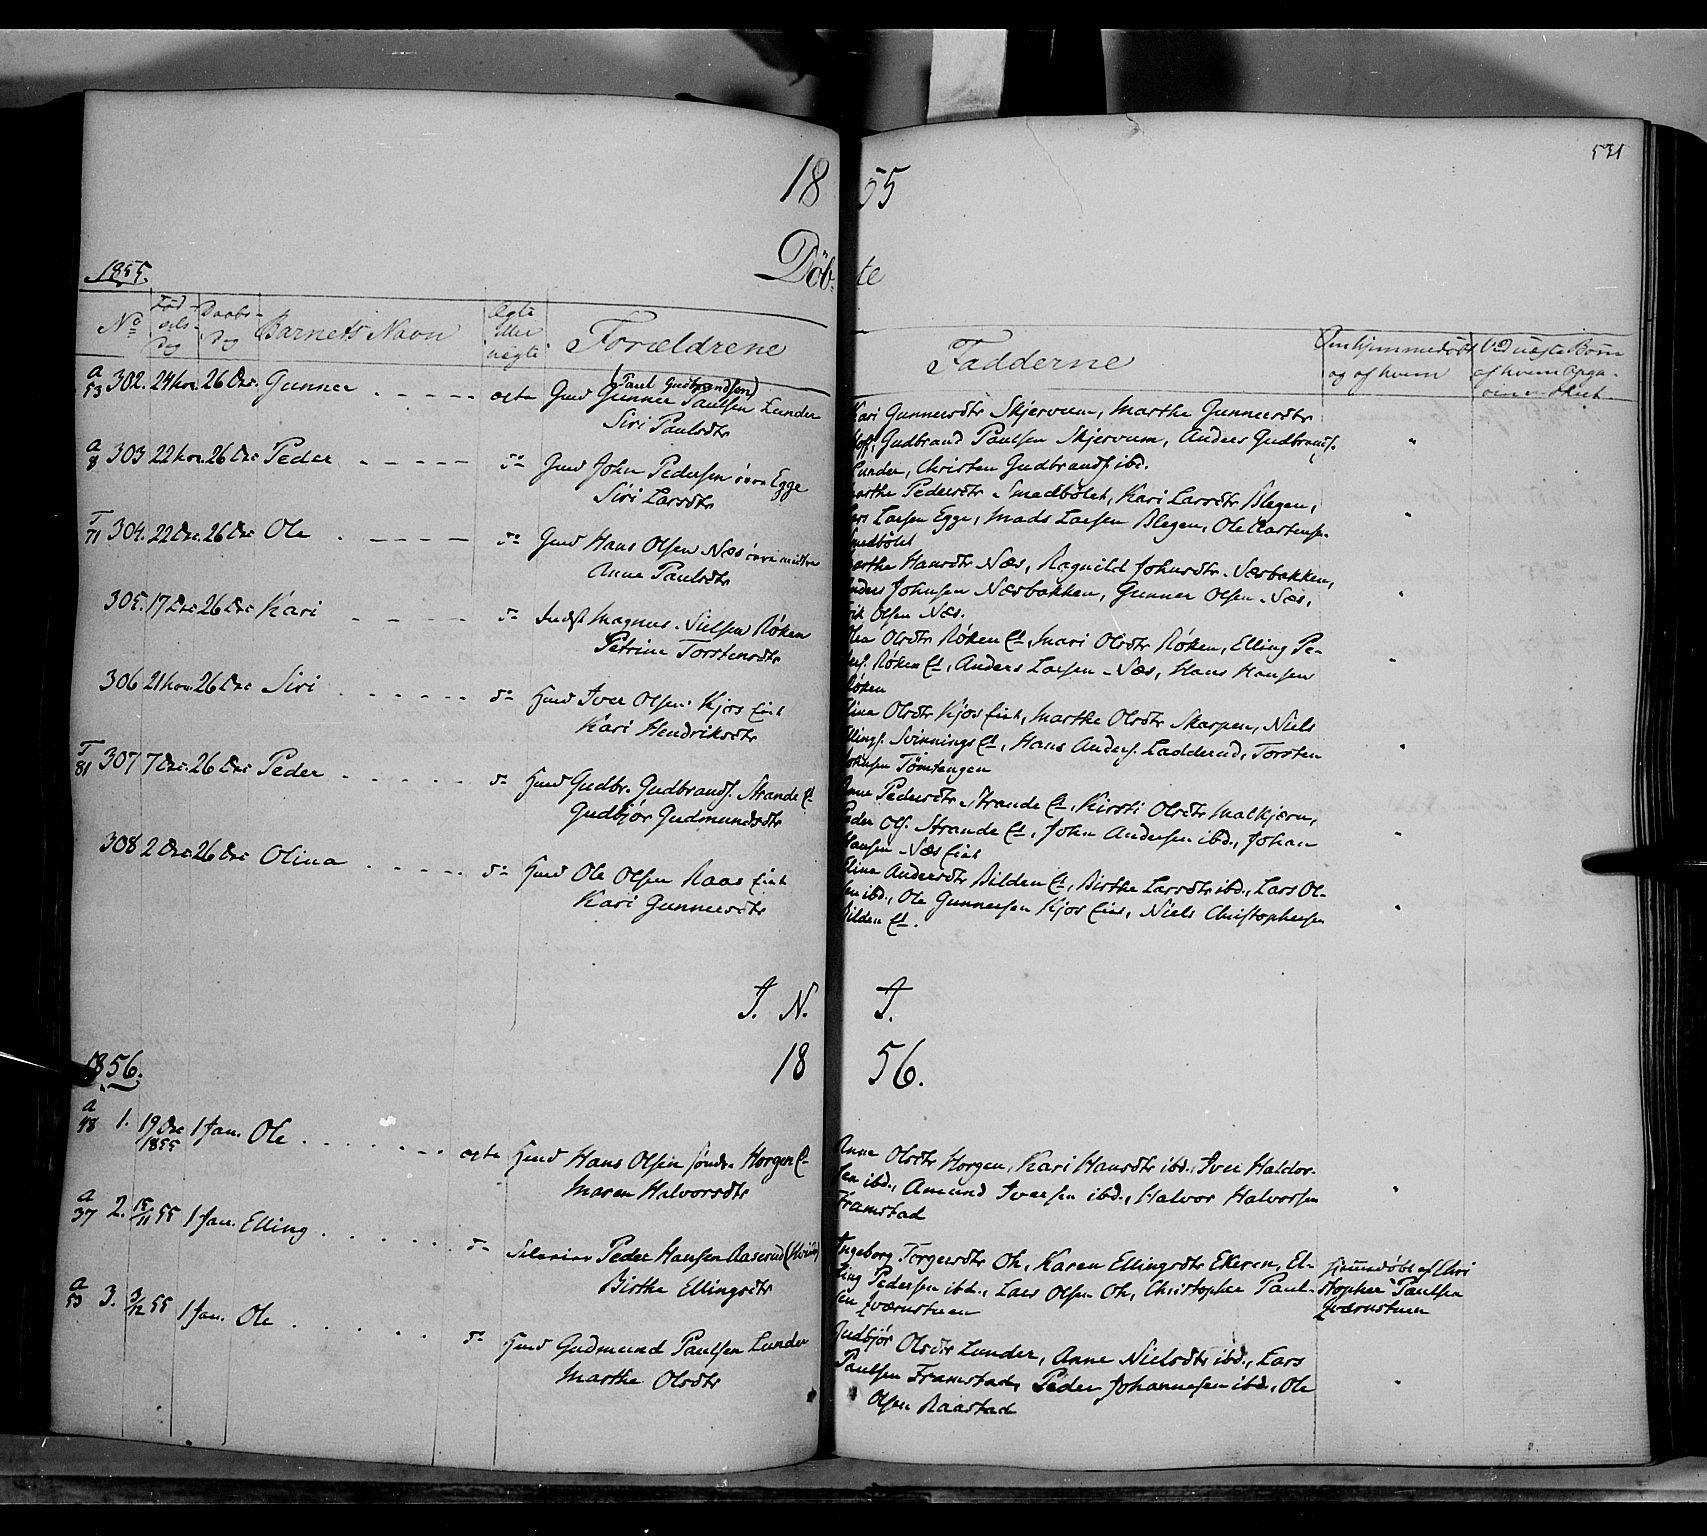 SAH, Gran prestekontor, Ministerialbok nr. 11, 1842-1856, s. 530-531